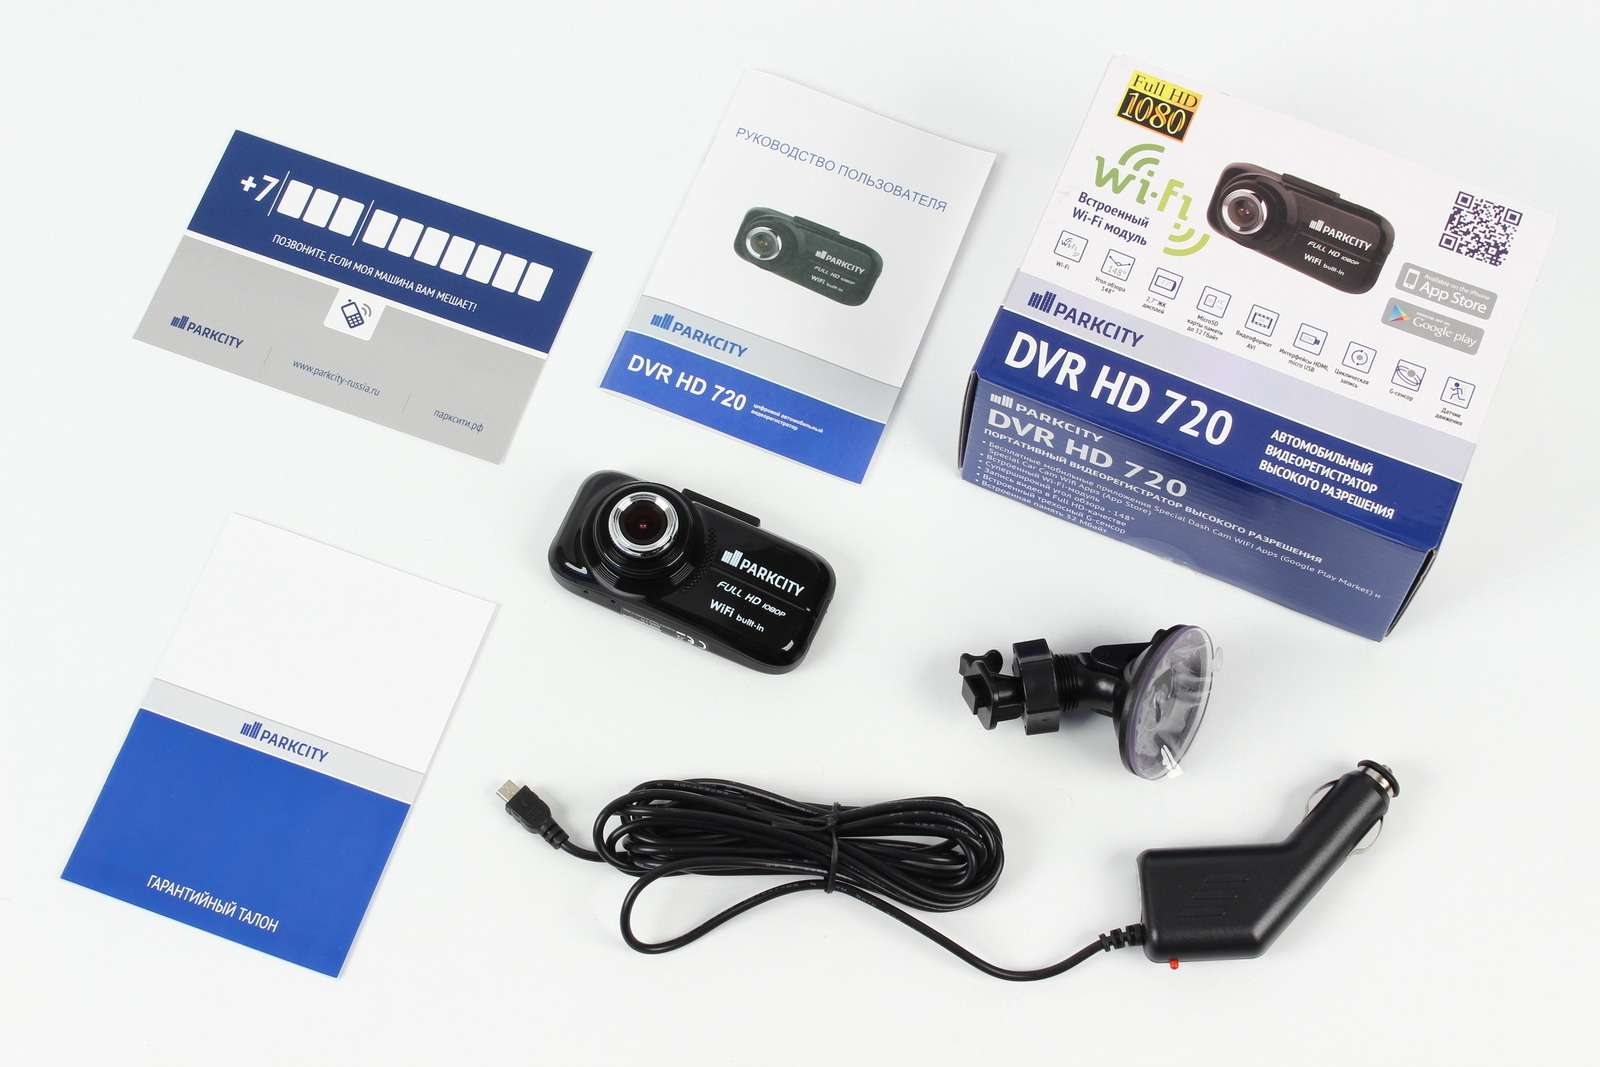 Parkcity DVR HD72002